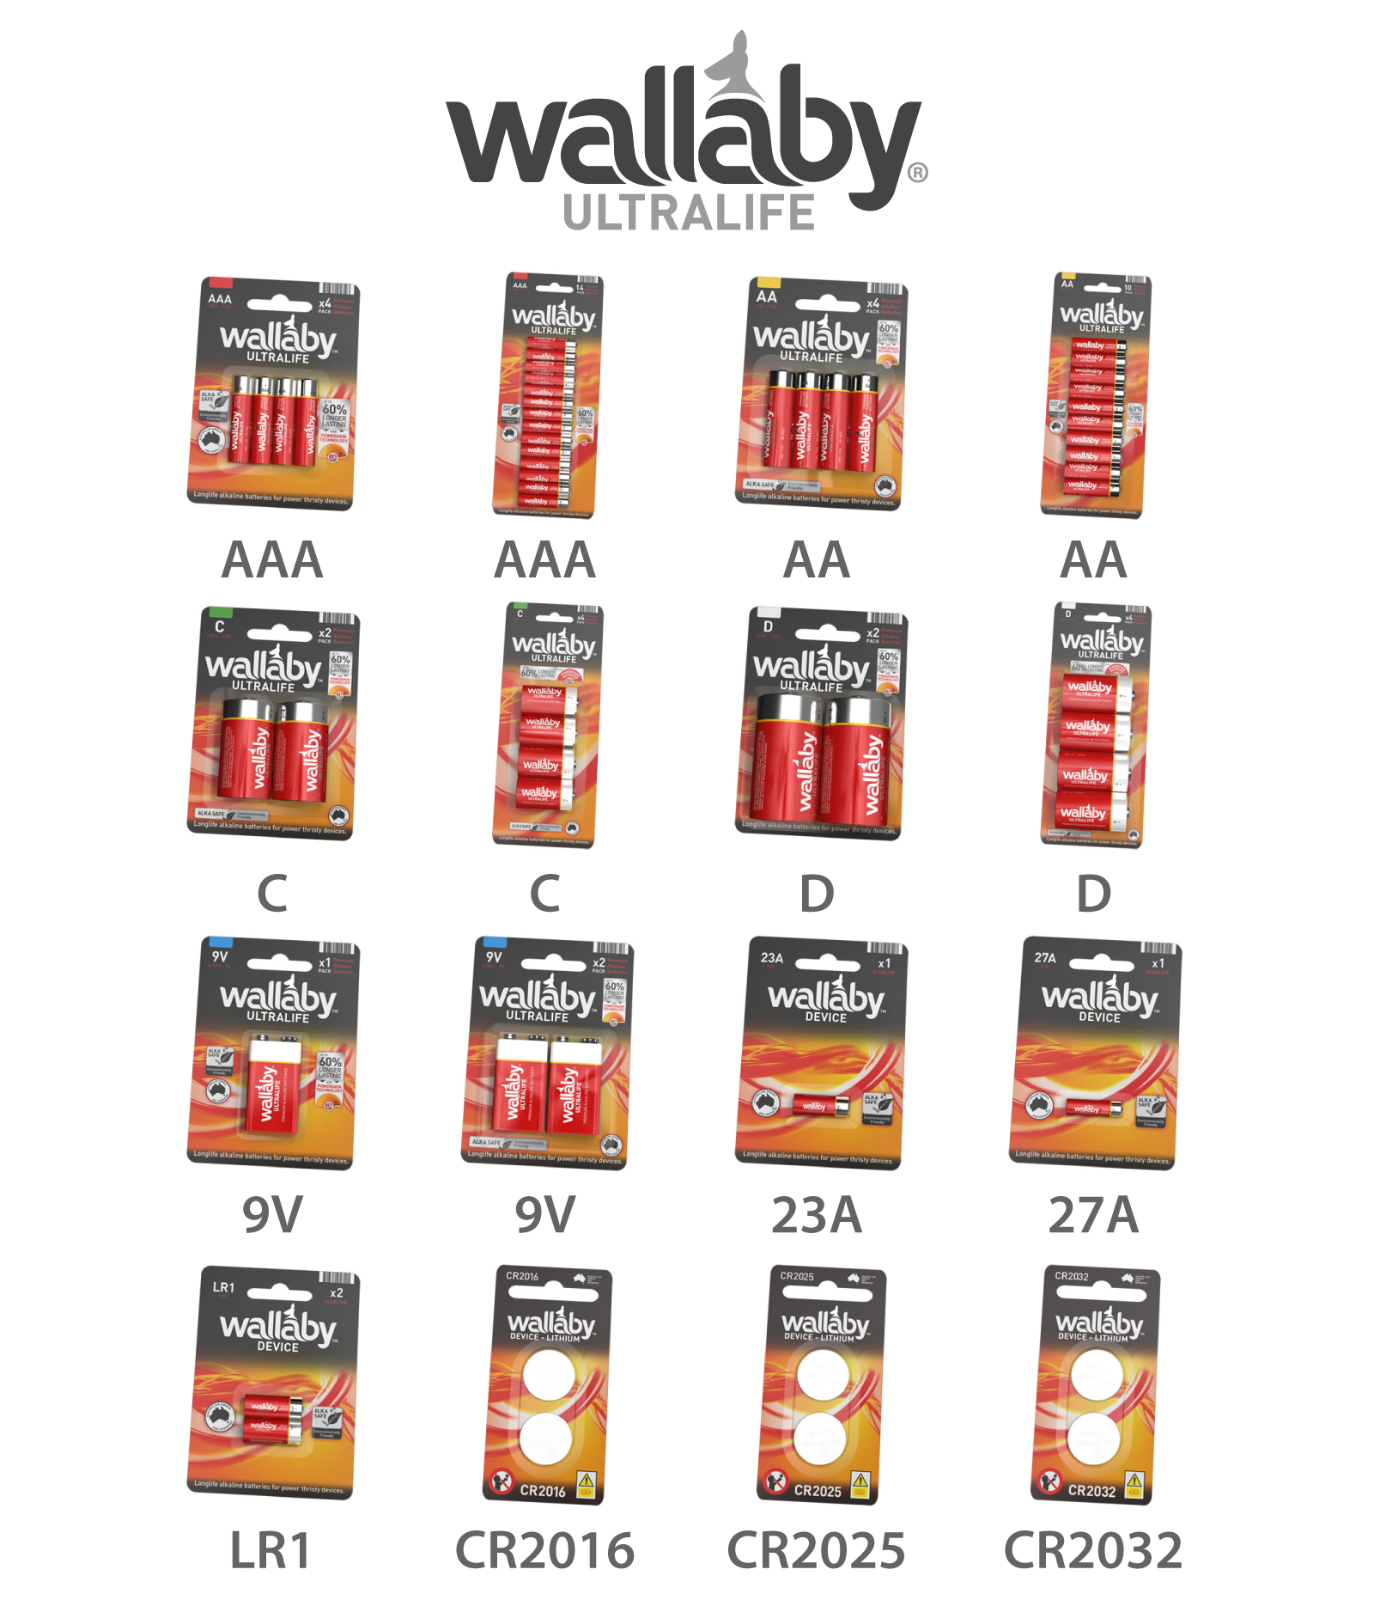 Wallaby Alkaline Batteries AA,AAA,C,D,9v,23A,27A,LR1,CR2016,CR2025,CR2032,12V 2